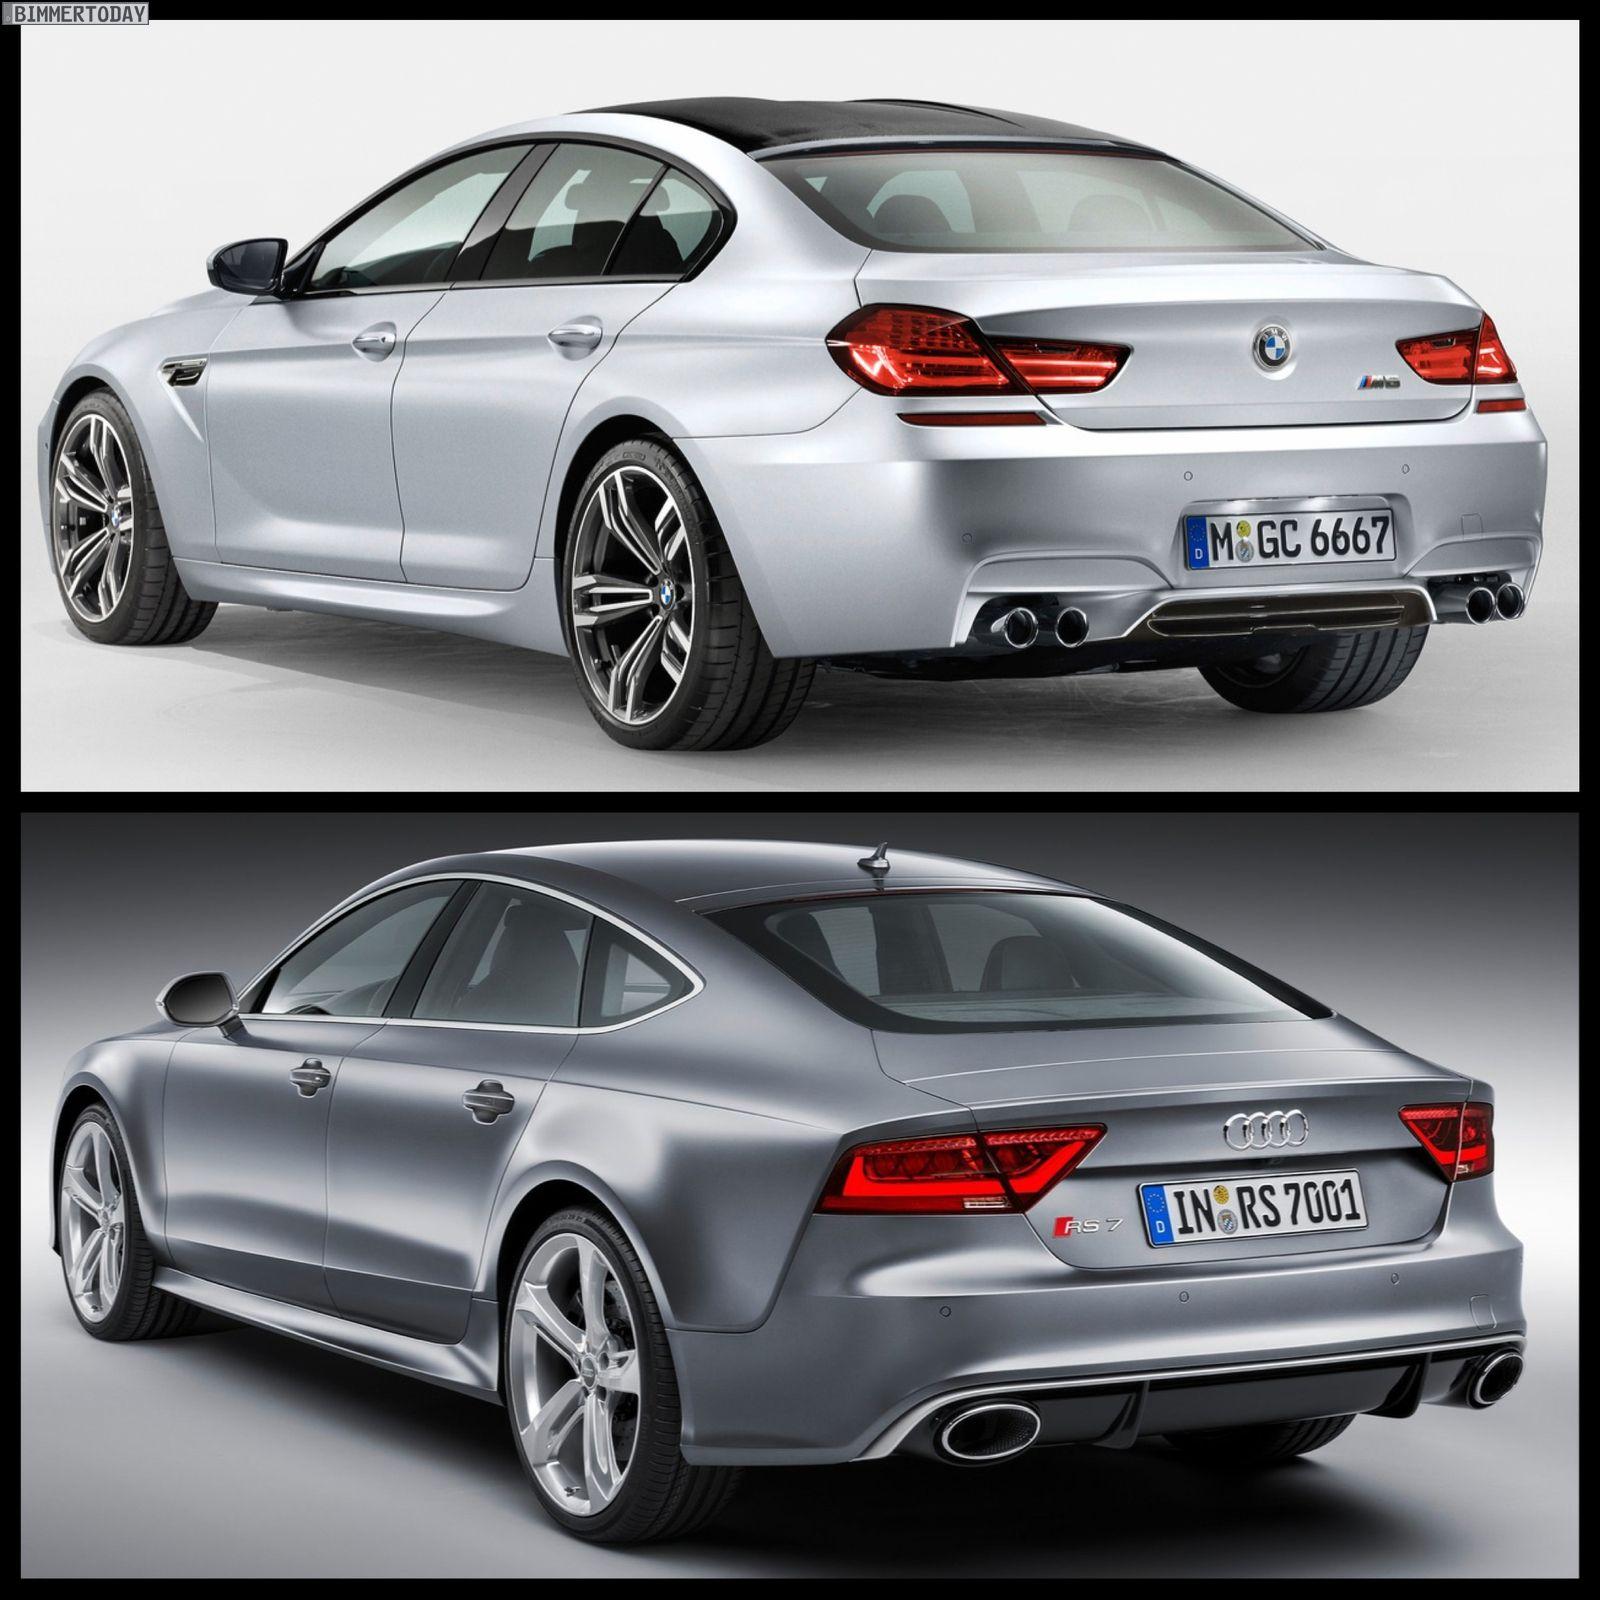 Tag For Audi A7 2018 2018 Audi A7 Exterior Sportback 3d: Audi Rs7 Sportback, Bmw